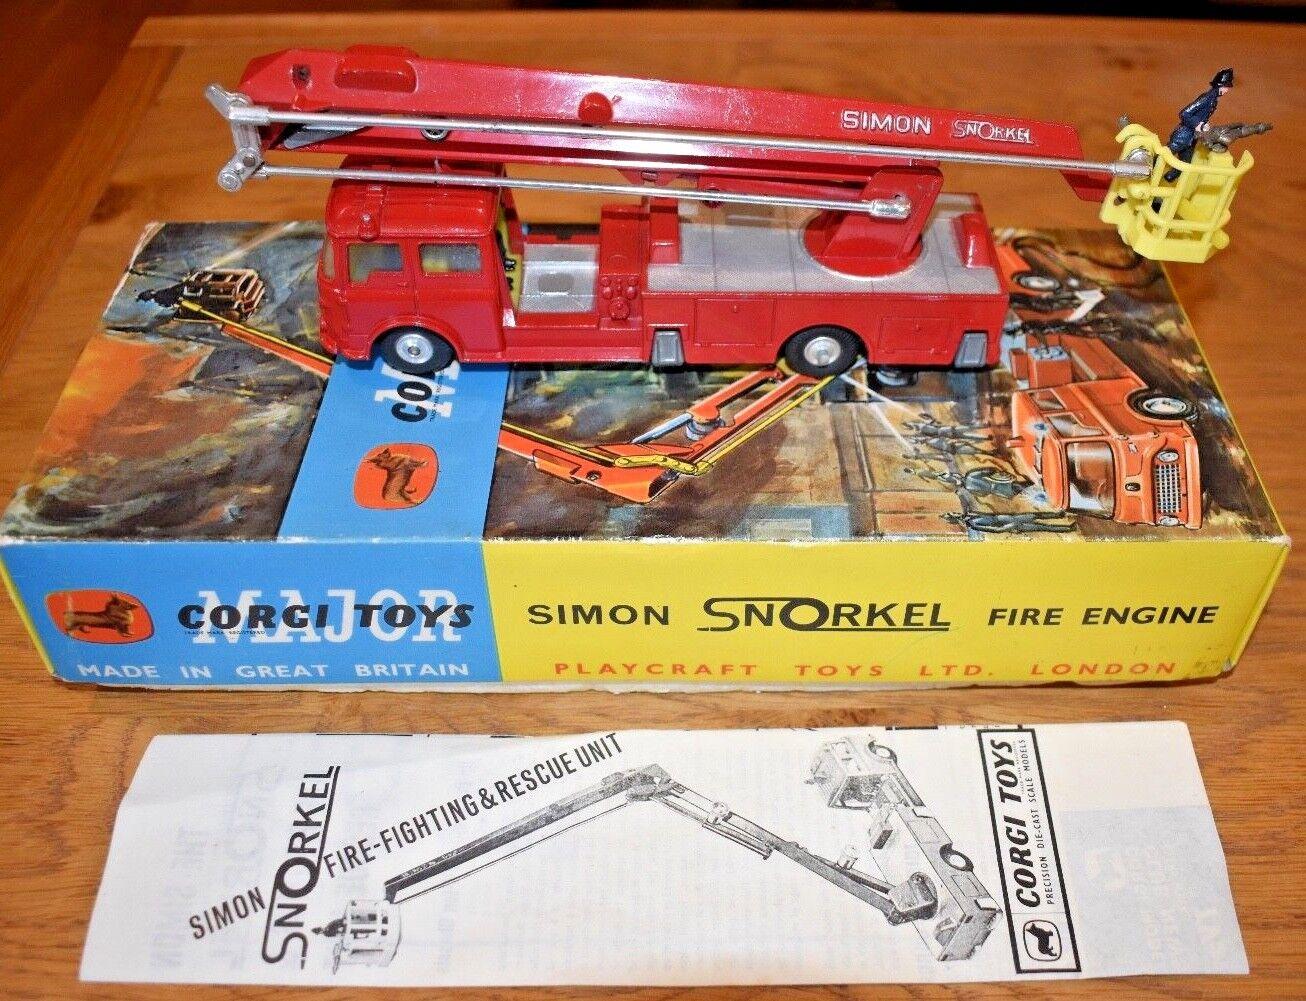 Vintage Corgi Major Toys 1127 Simon Snorkel Fire Engine; Original Box